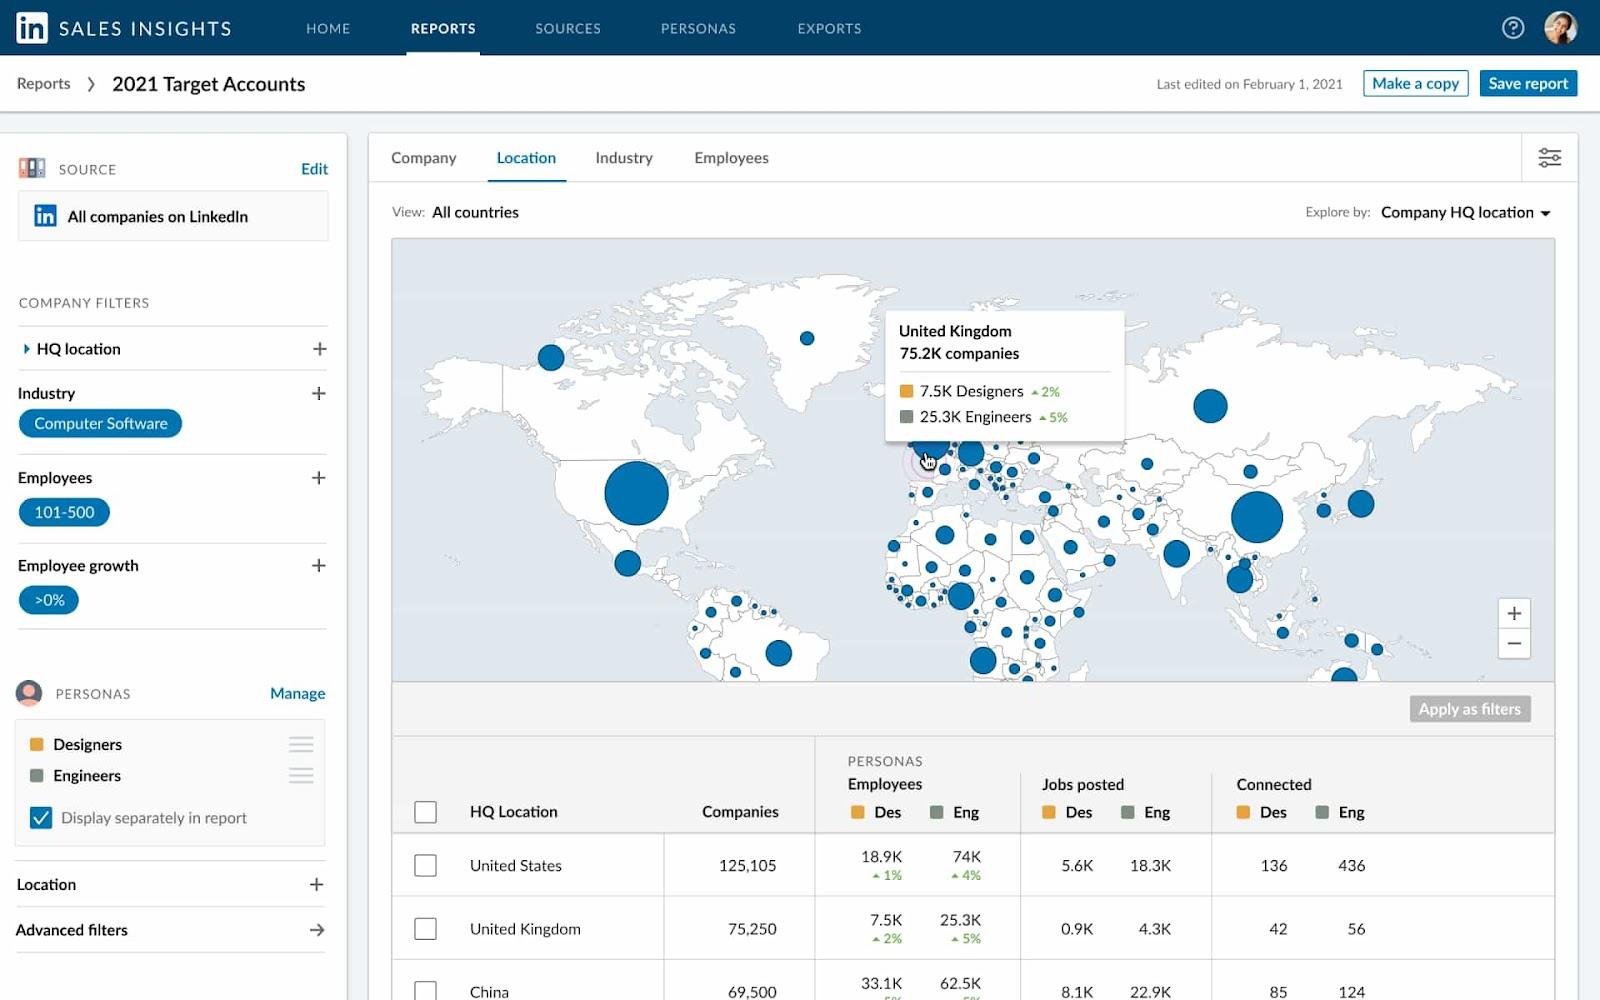 LinkedIn Sales Insights Interface